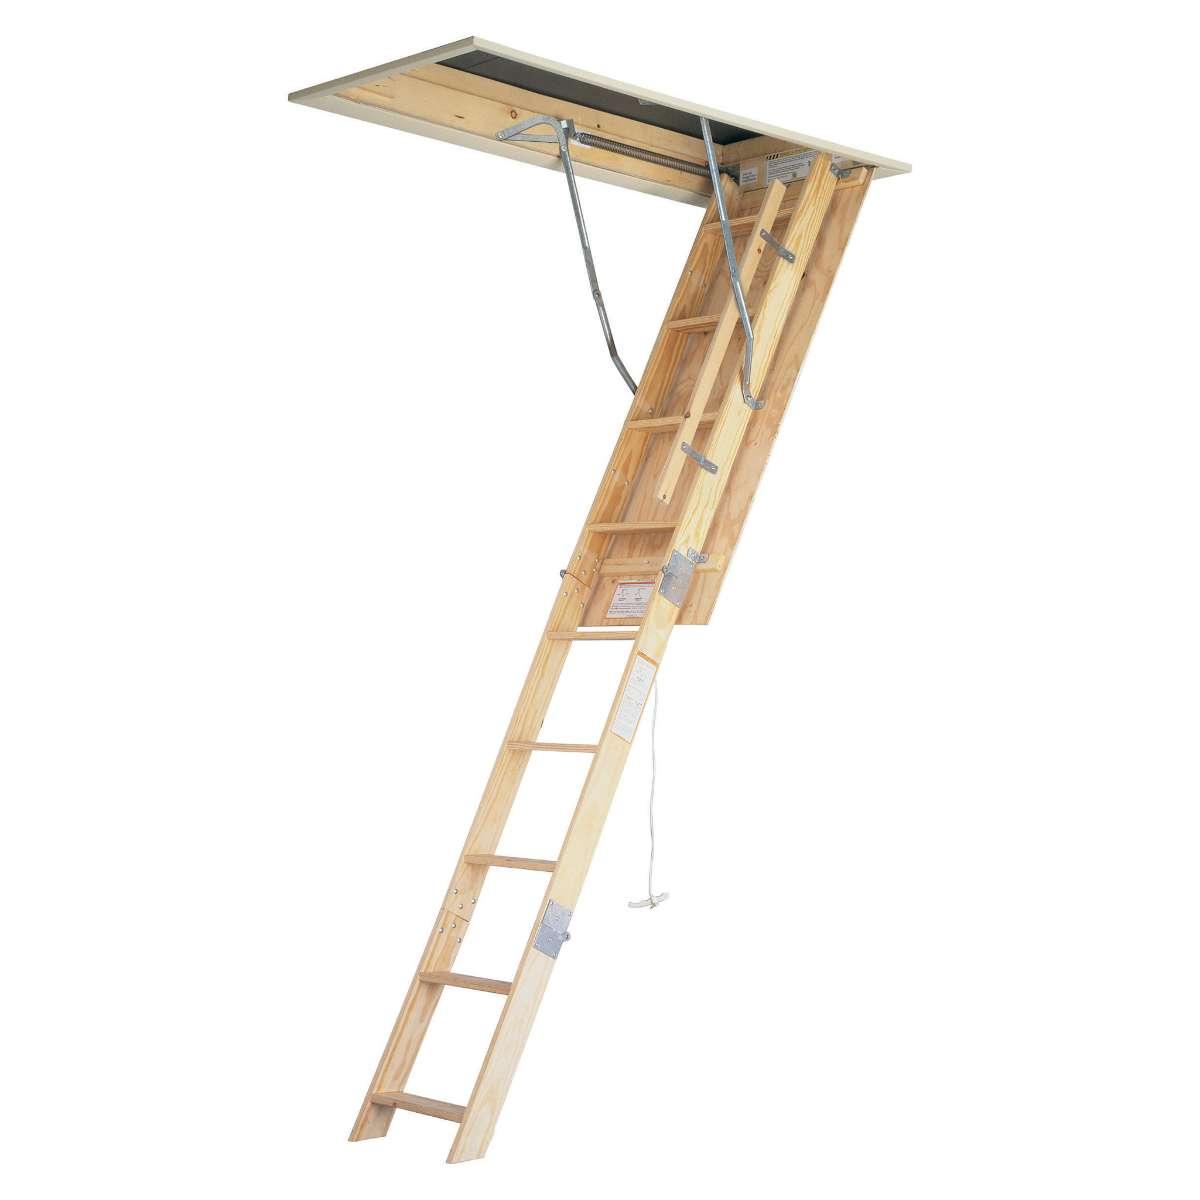 Attic Access Ladders Folding Amp Telescoping Attic Ladders